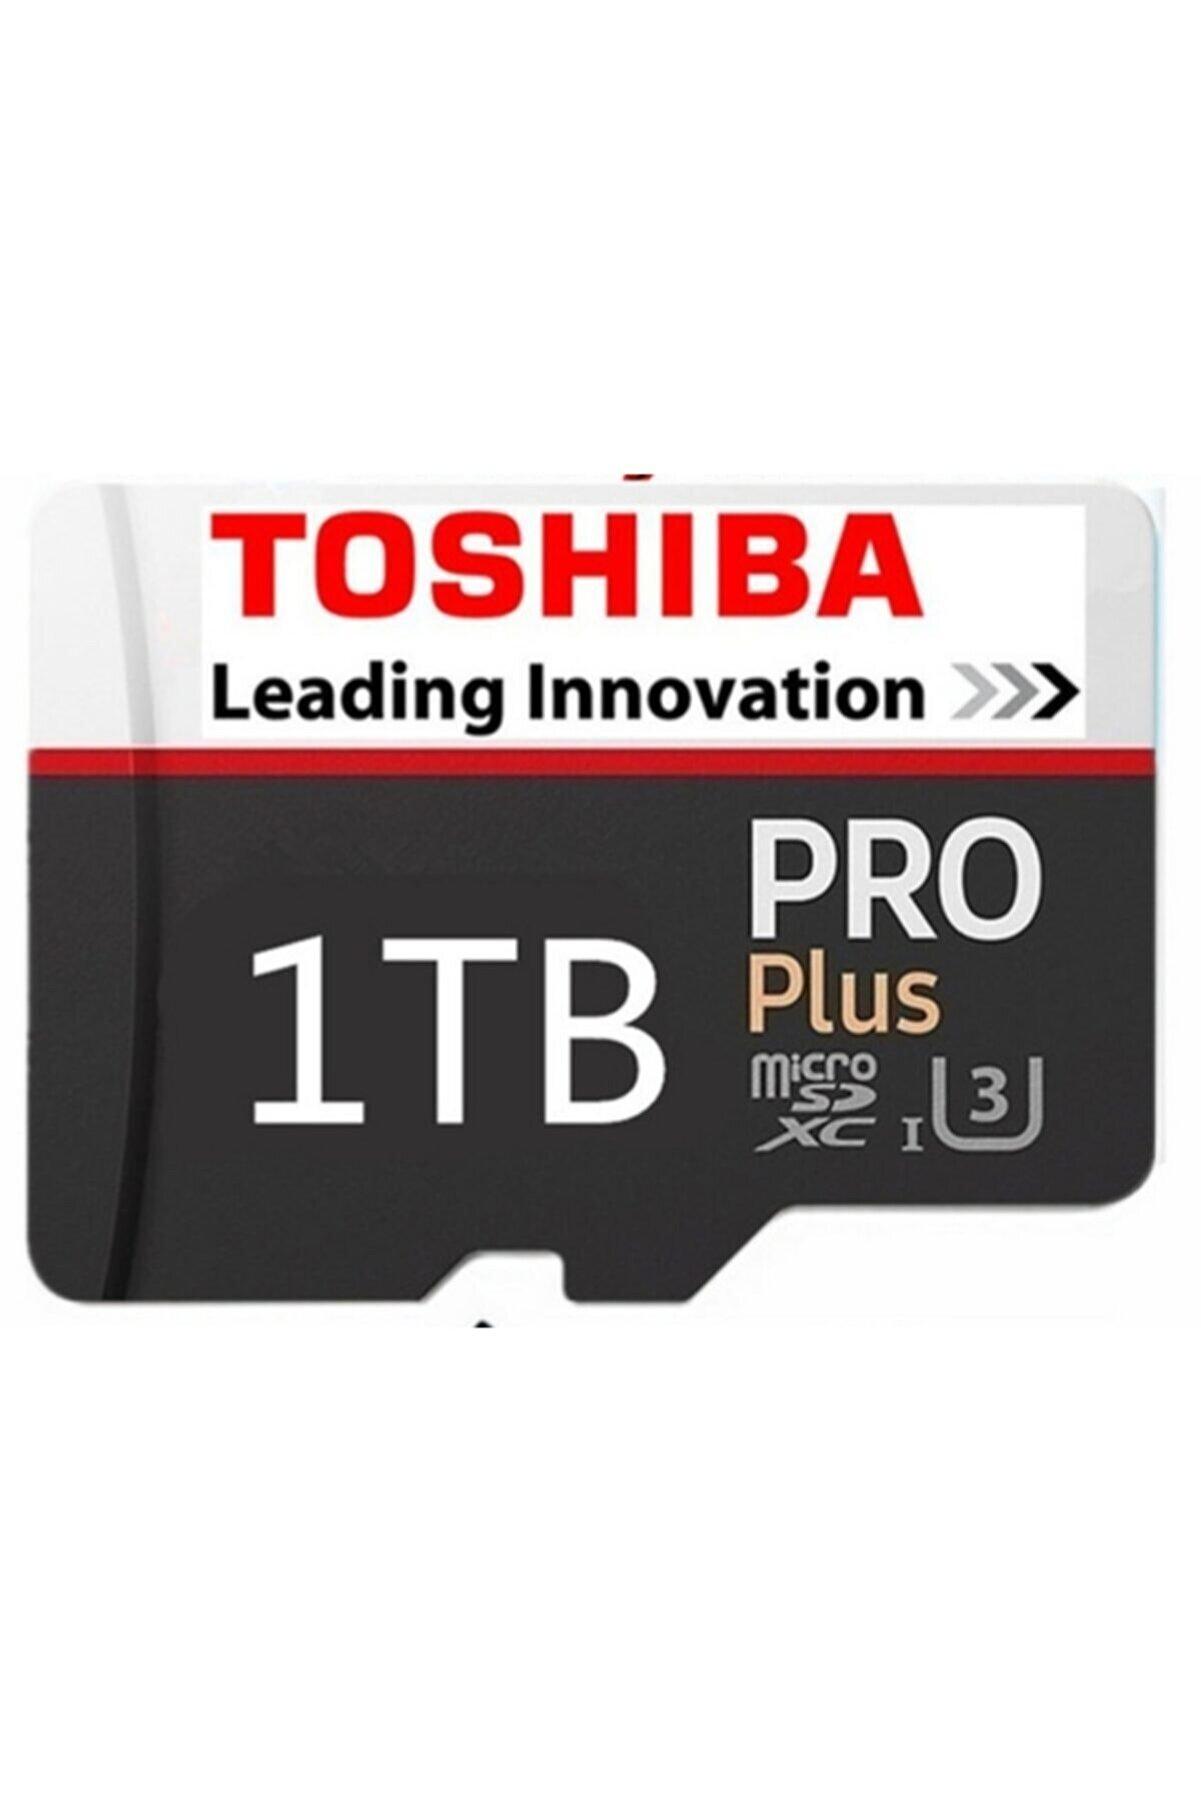 SNAZZY 1 Tb Toshıba Micro Sd Kart